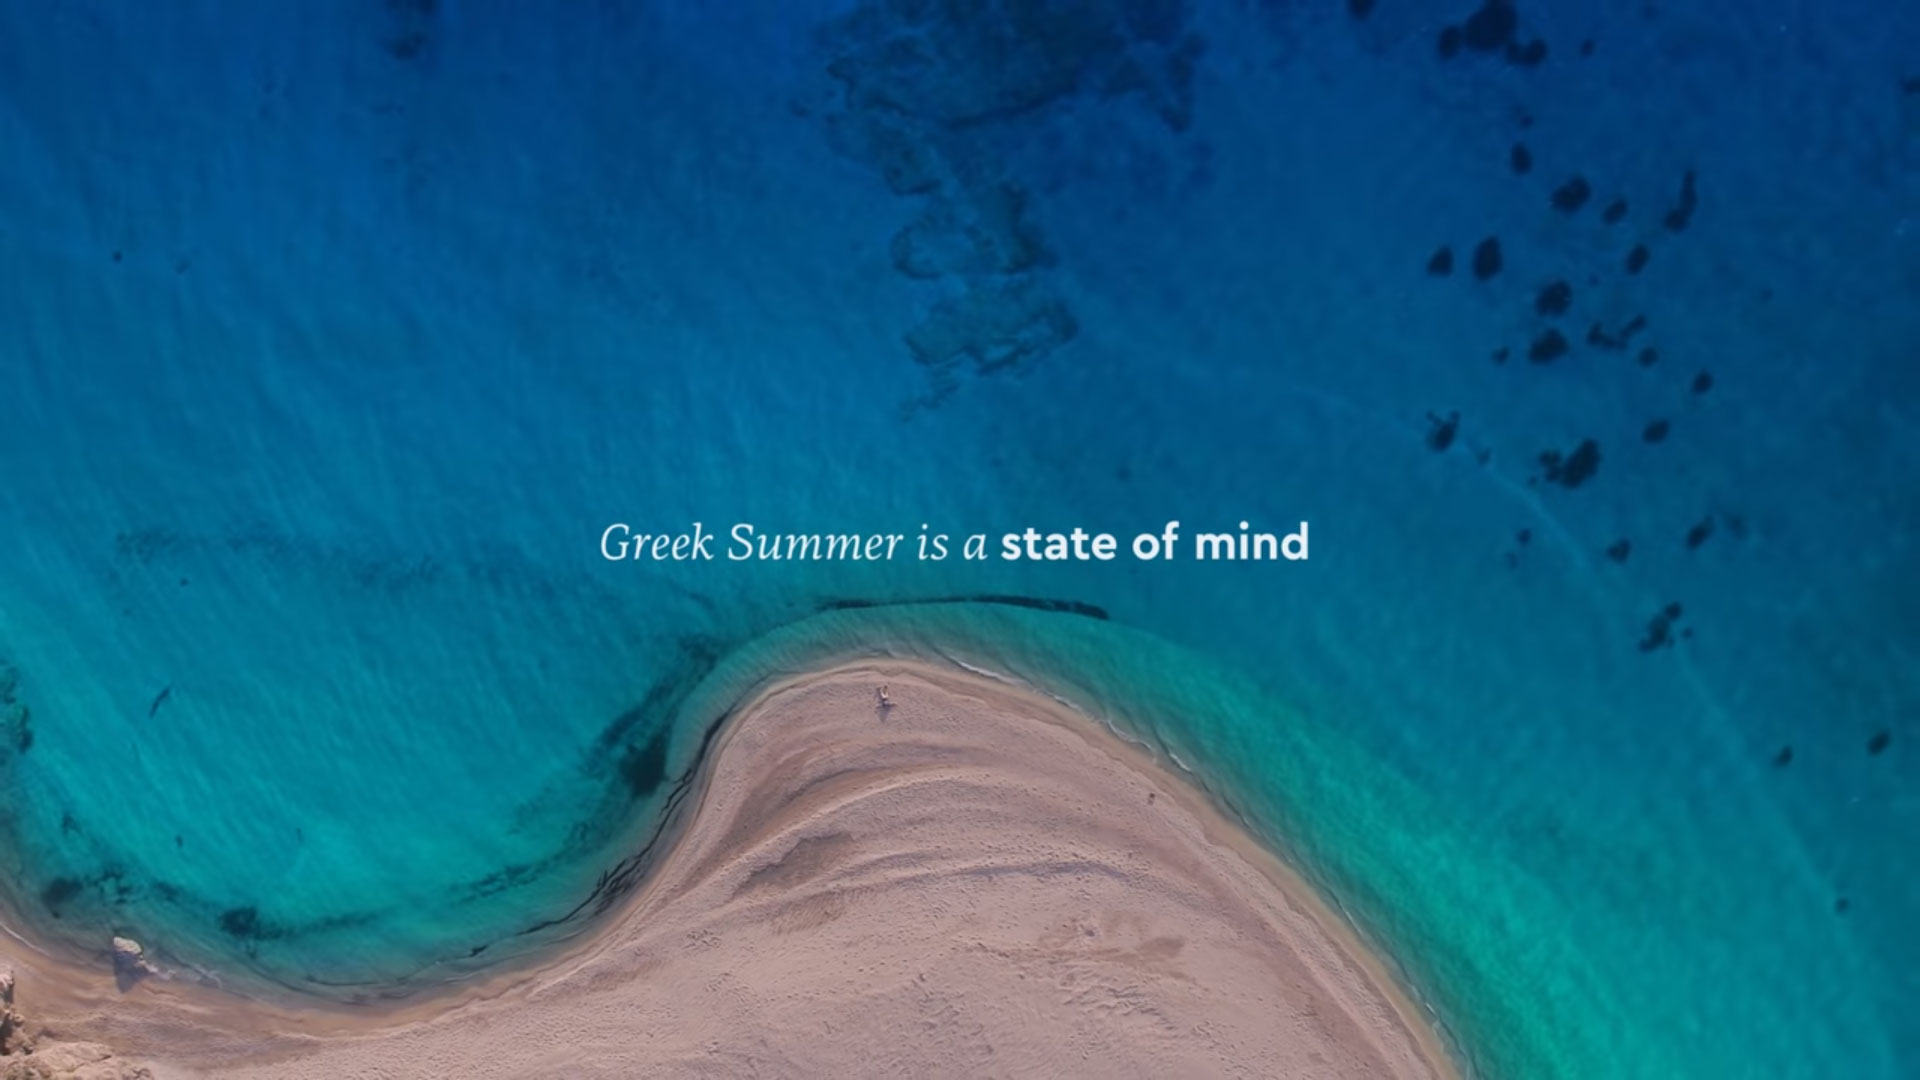 """The Greek Summer is a State of Mind"" – Το σποτ της νέας καμπάνιας για τον τουρισμό!"